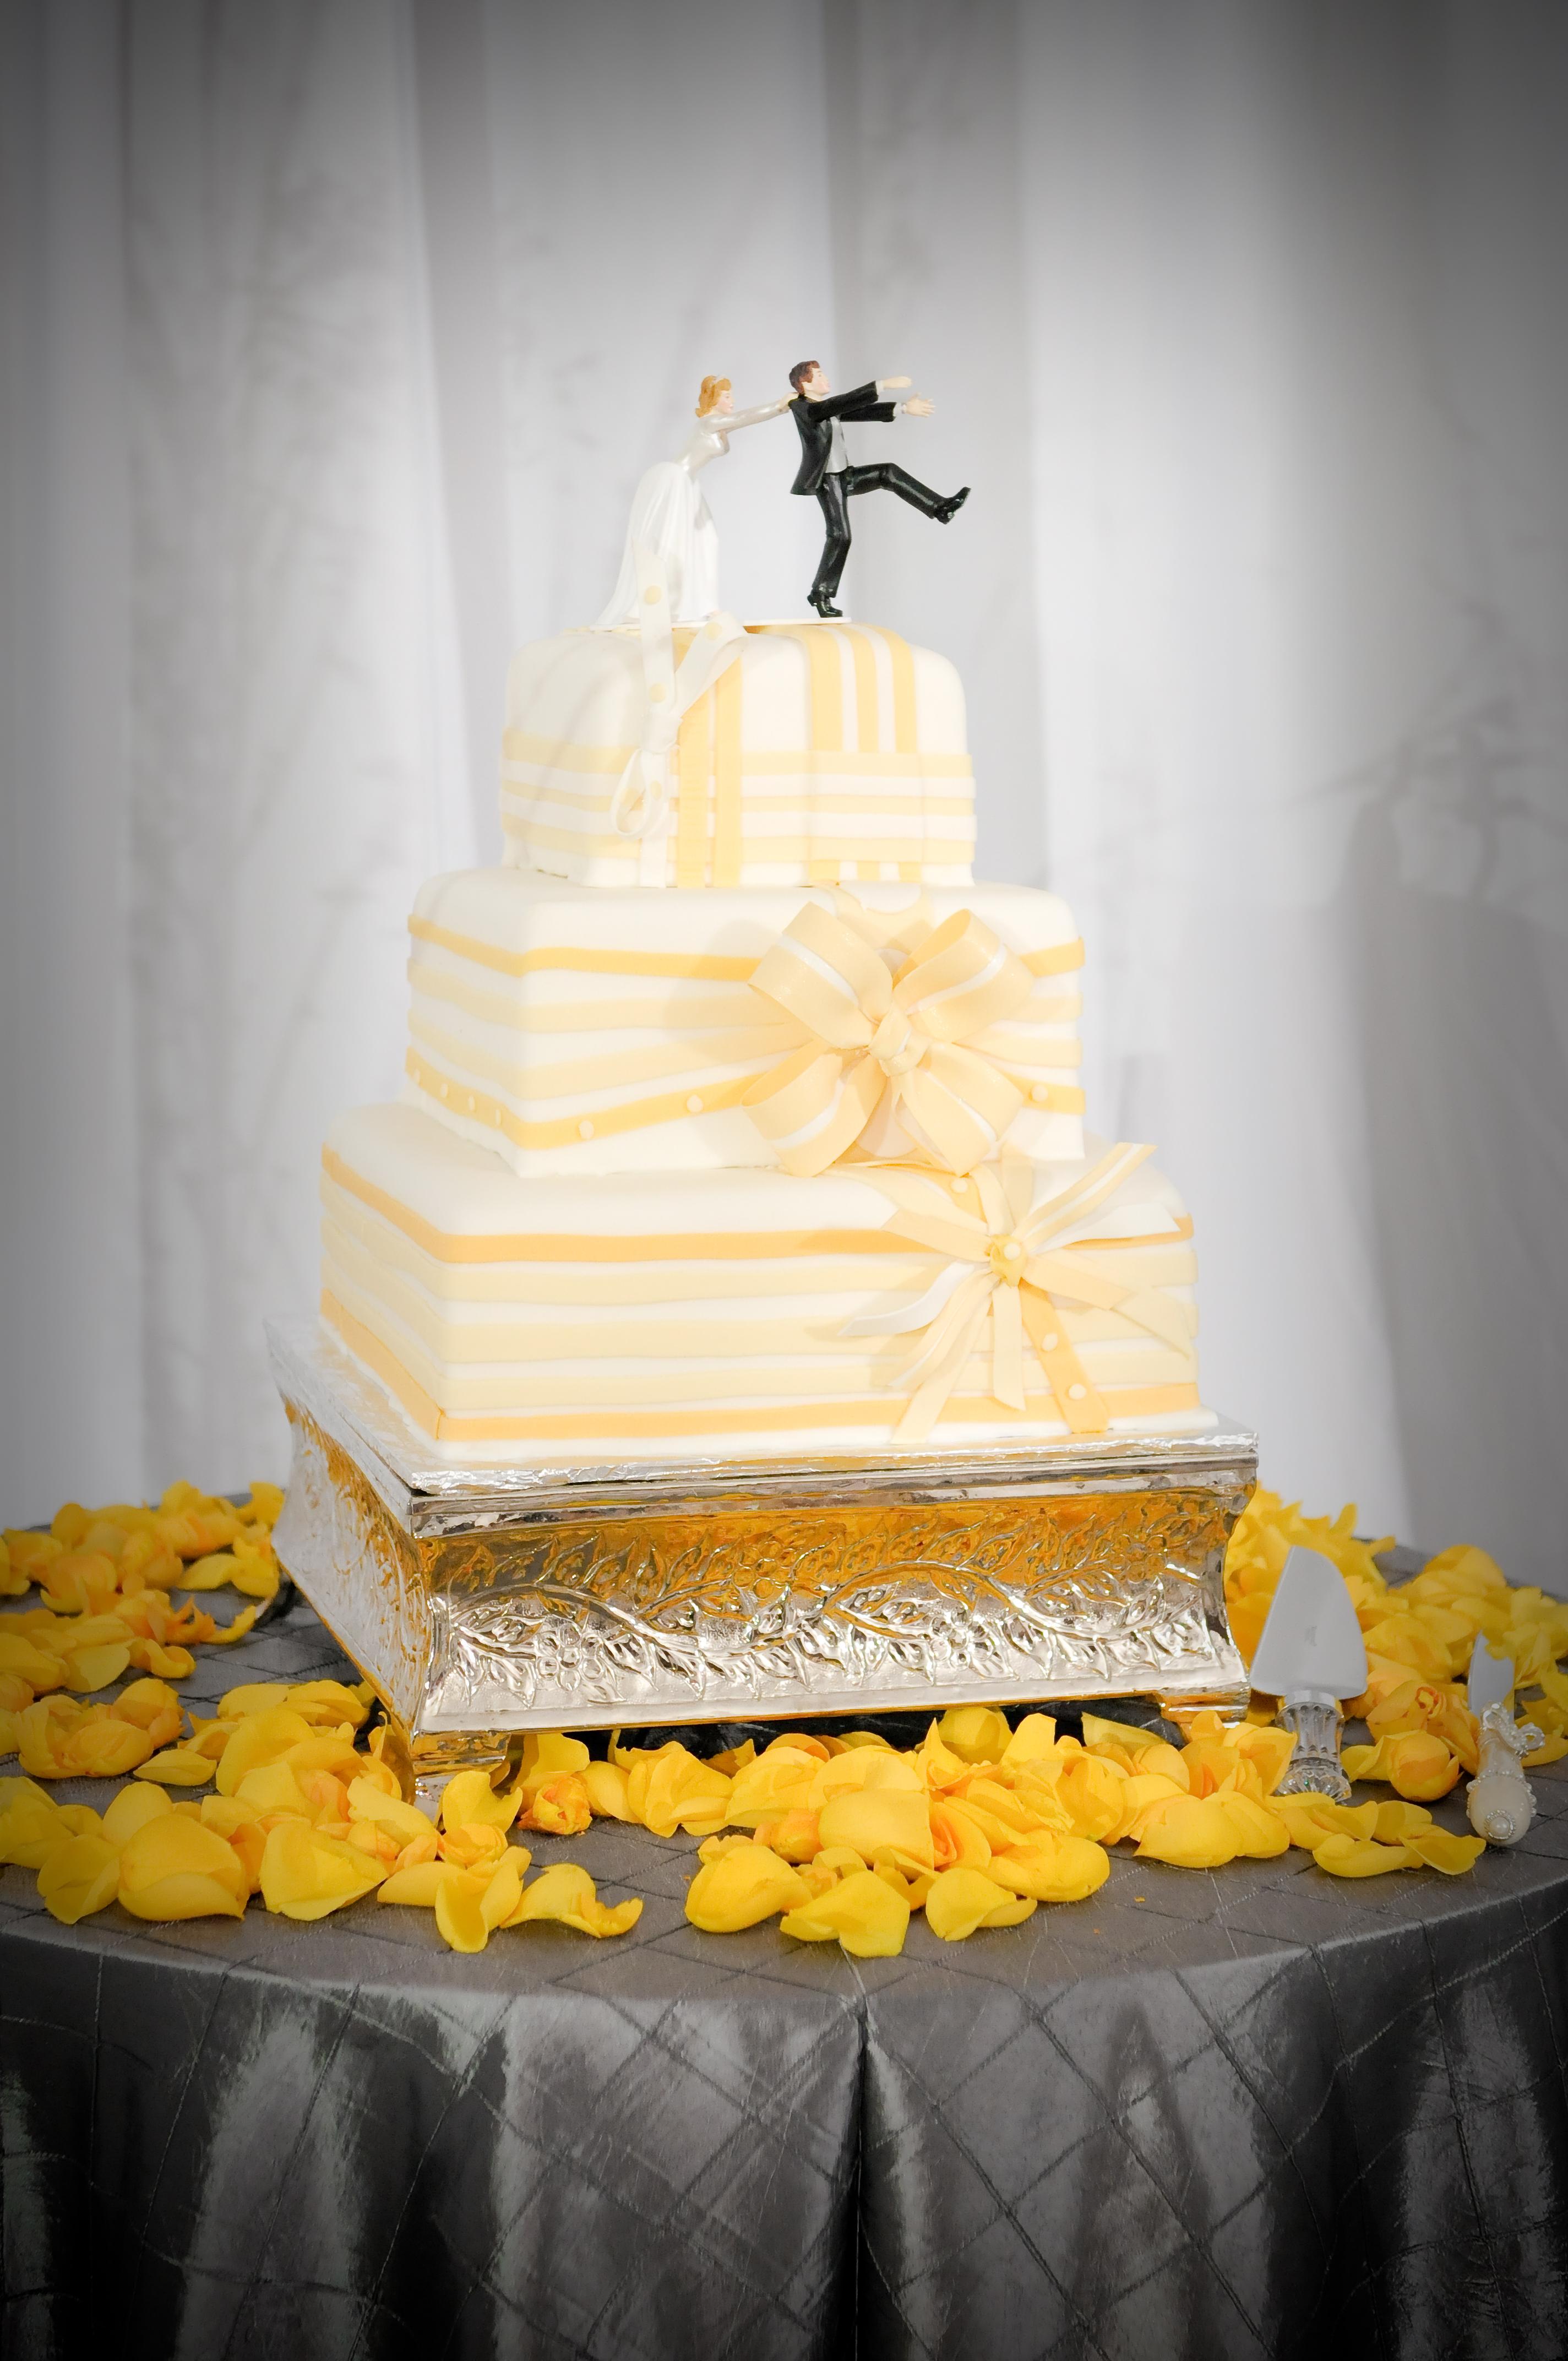 Orlando Wedding Themes & Ideas | PartySlate